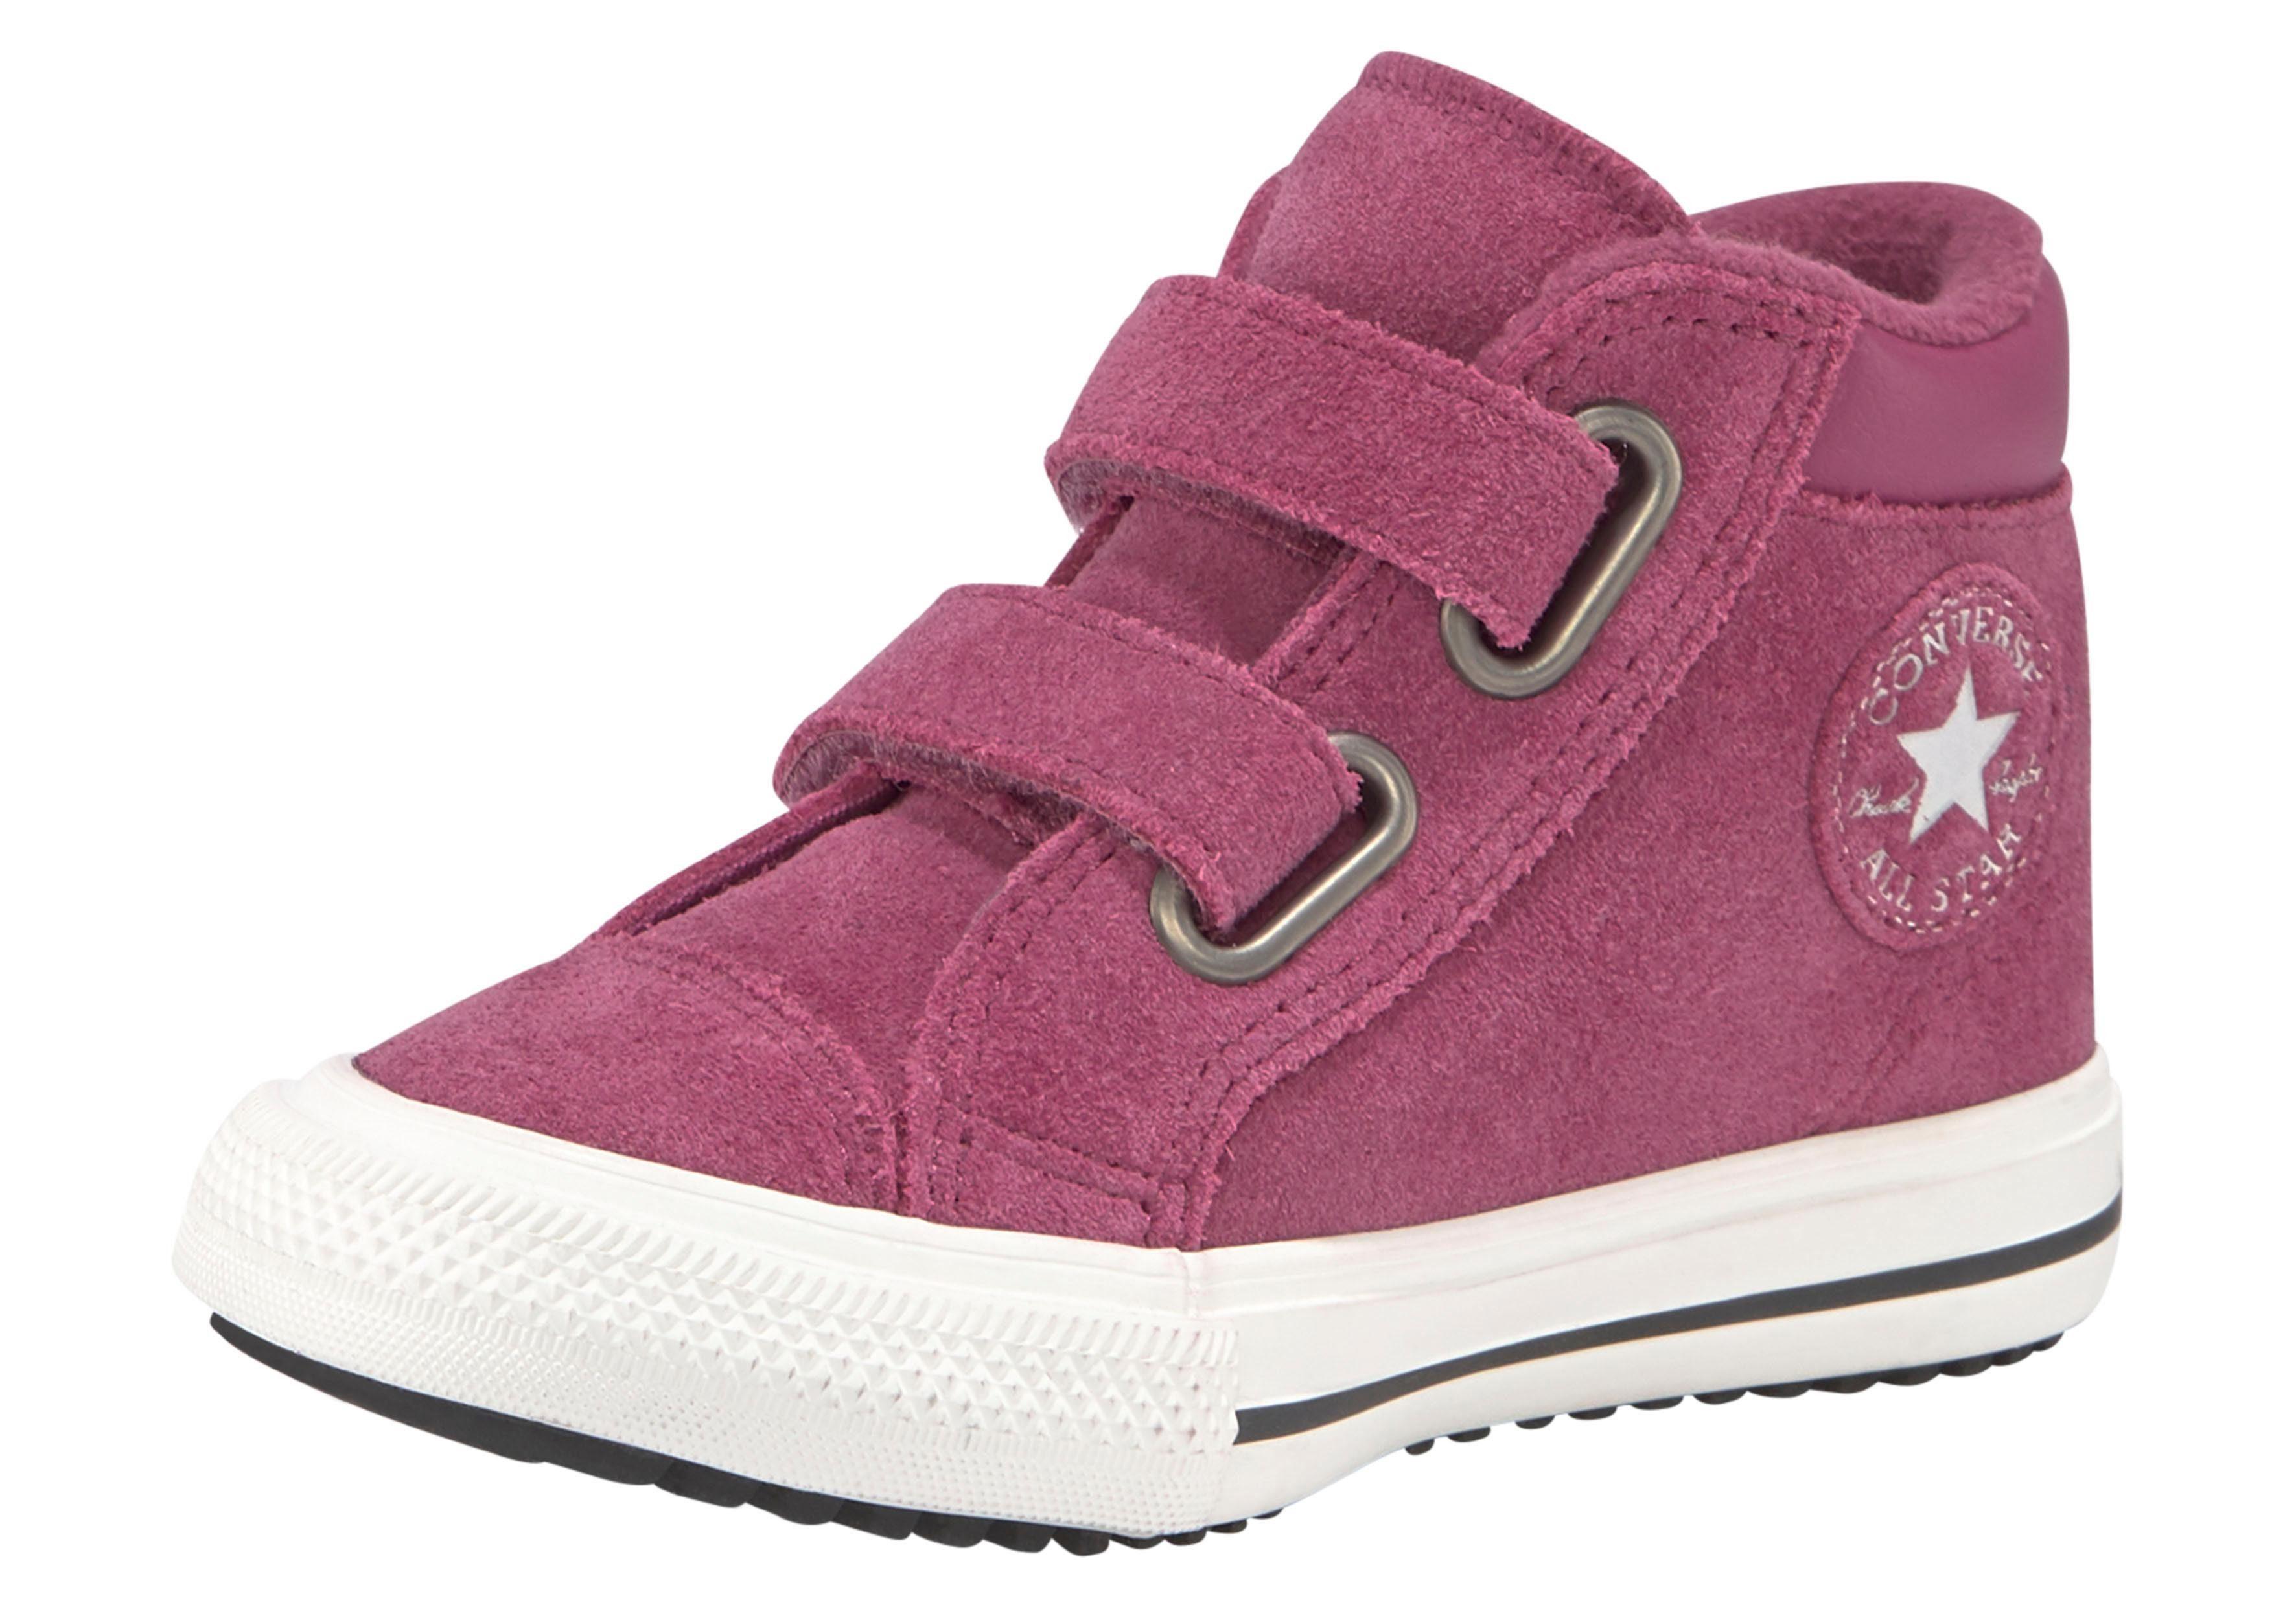 Converse »KINDER CHUCK TAYLOR ALL STAR PC BOOT 2V HI KLETT« Sneaker online kaufen   OTTO